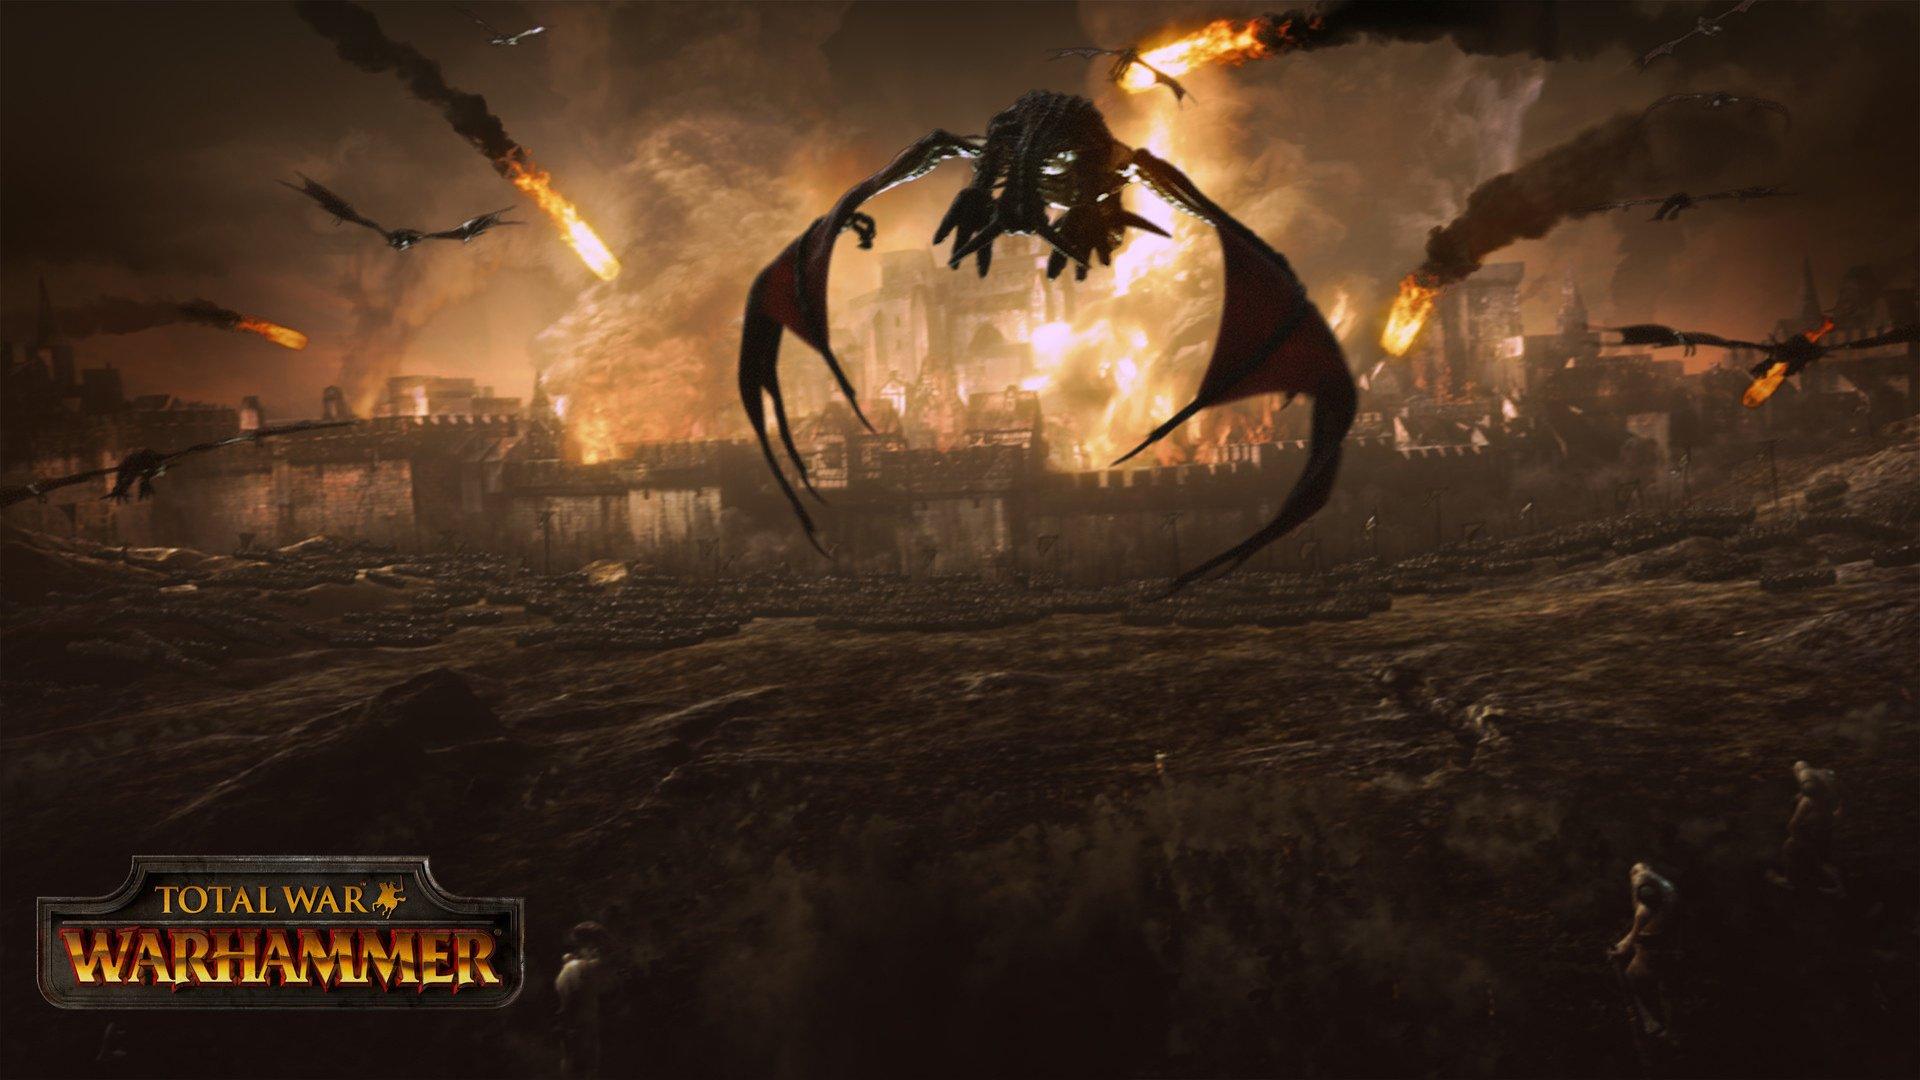 Total War Warhammer Hd Wallpaper Background Image 1920x1080